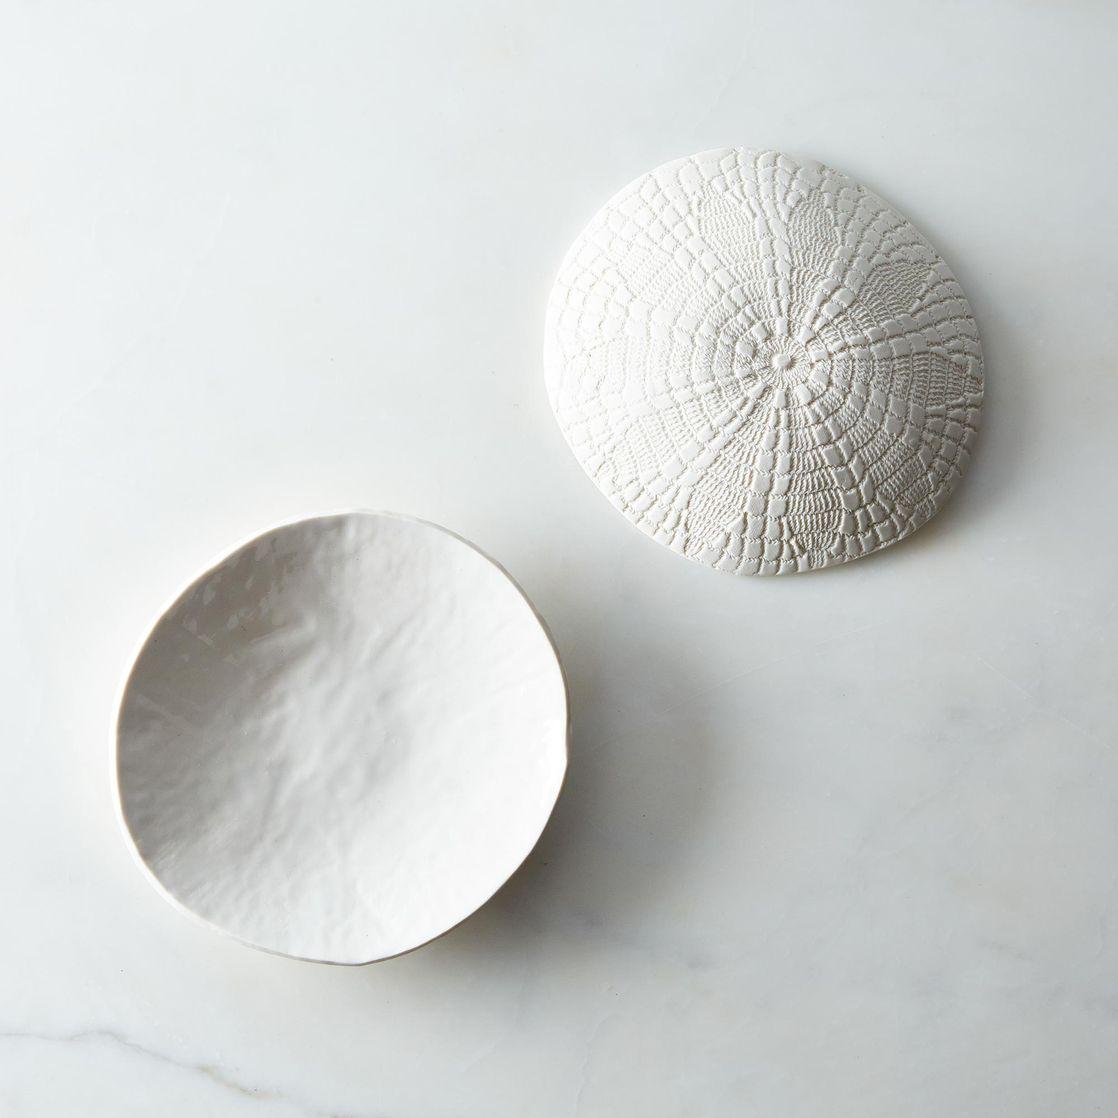 9f38765f-6bf8-4e35-9f0f-ce0f42b914eb--2014-1029_stuck-in-the-mud-pottery_white-ceramic-shallow-bowl-002